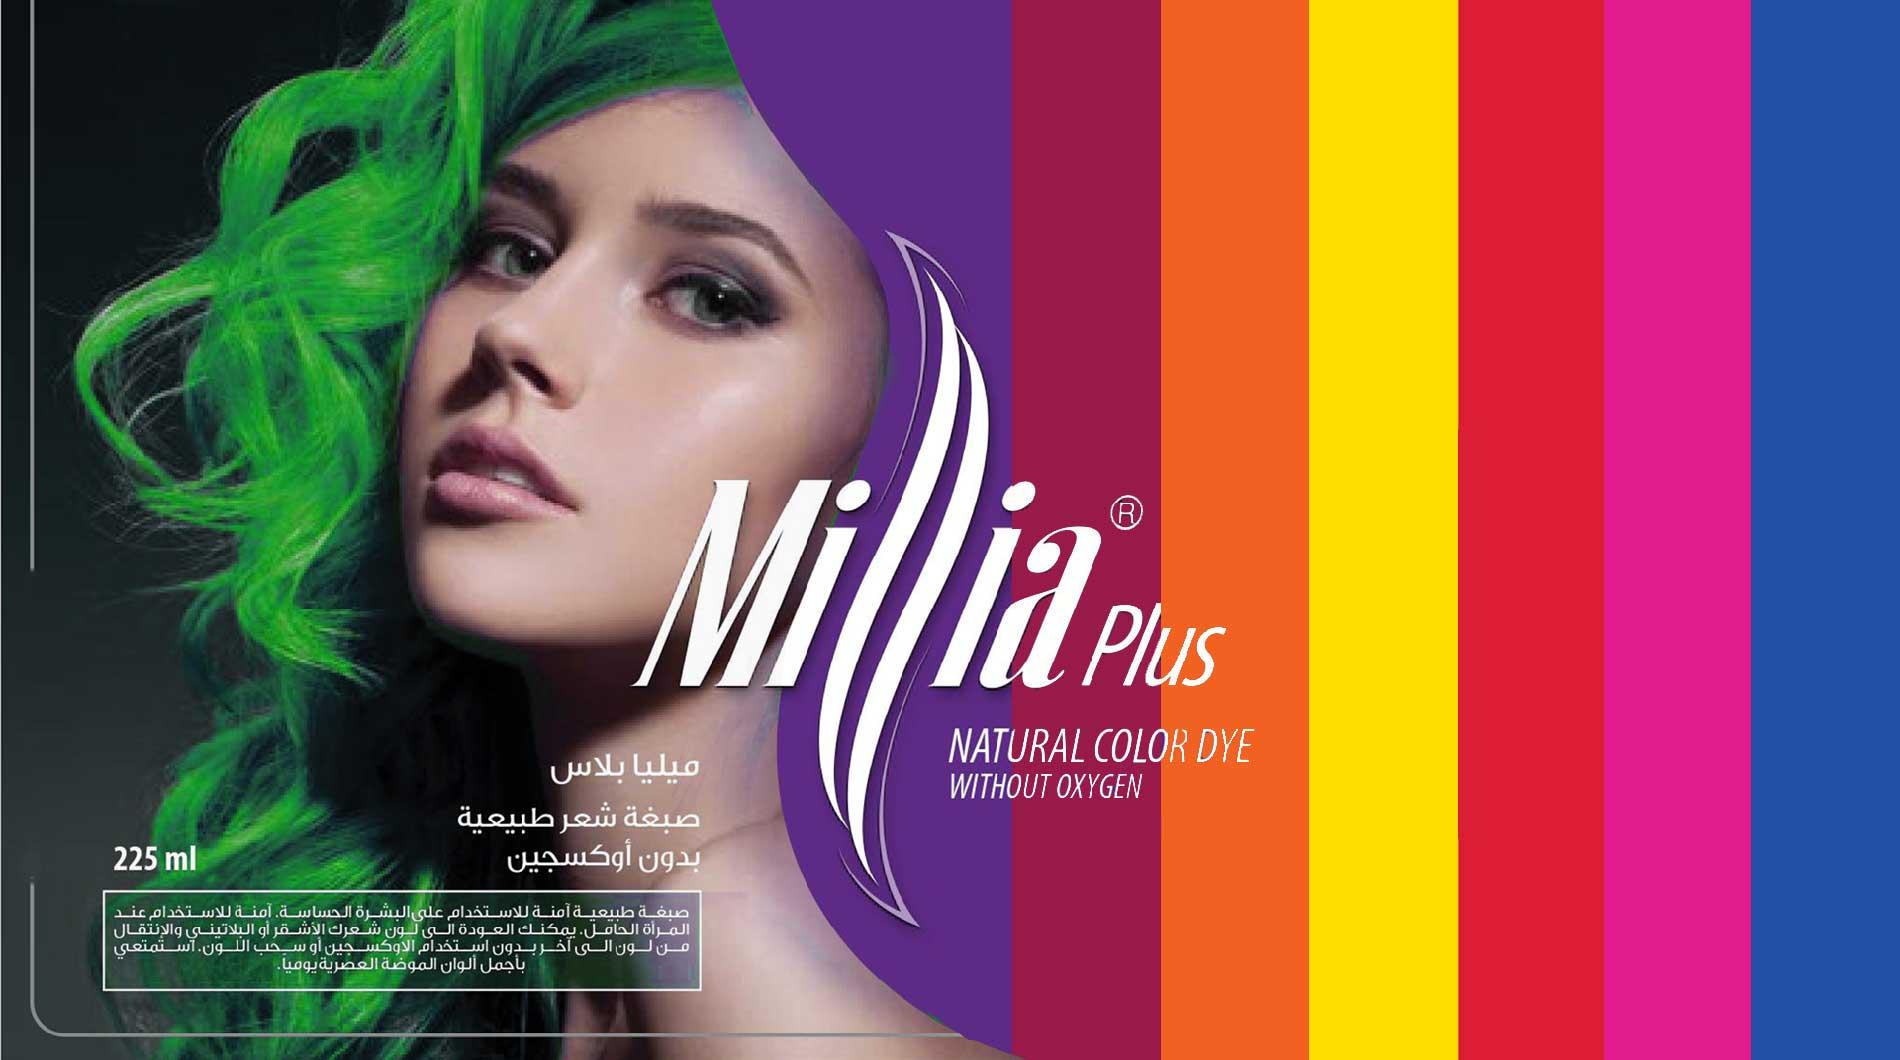 New Dye from Millia Plus